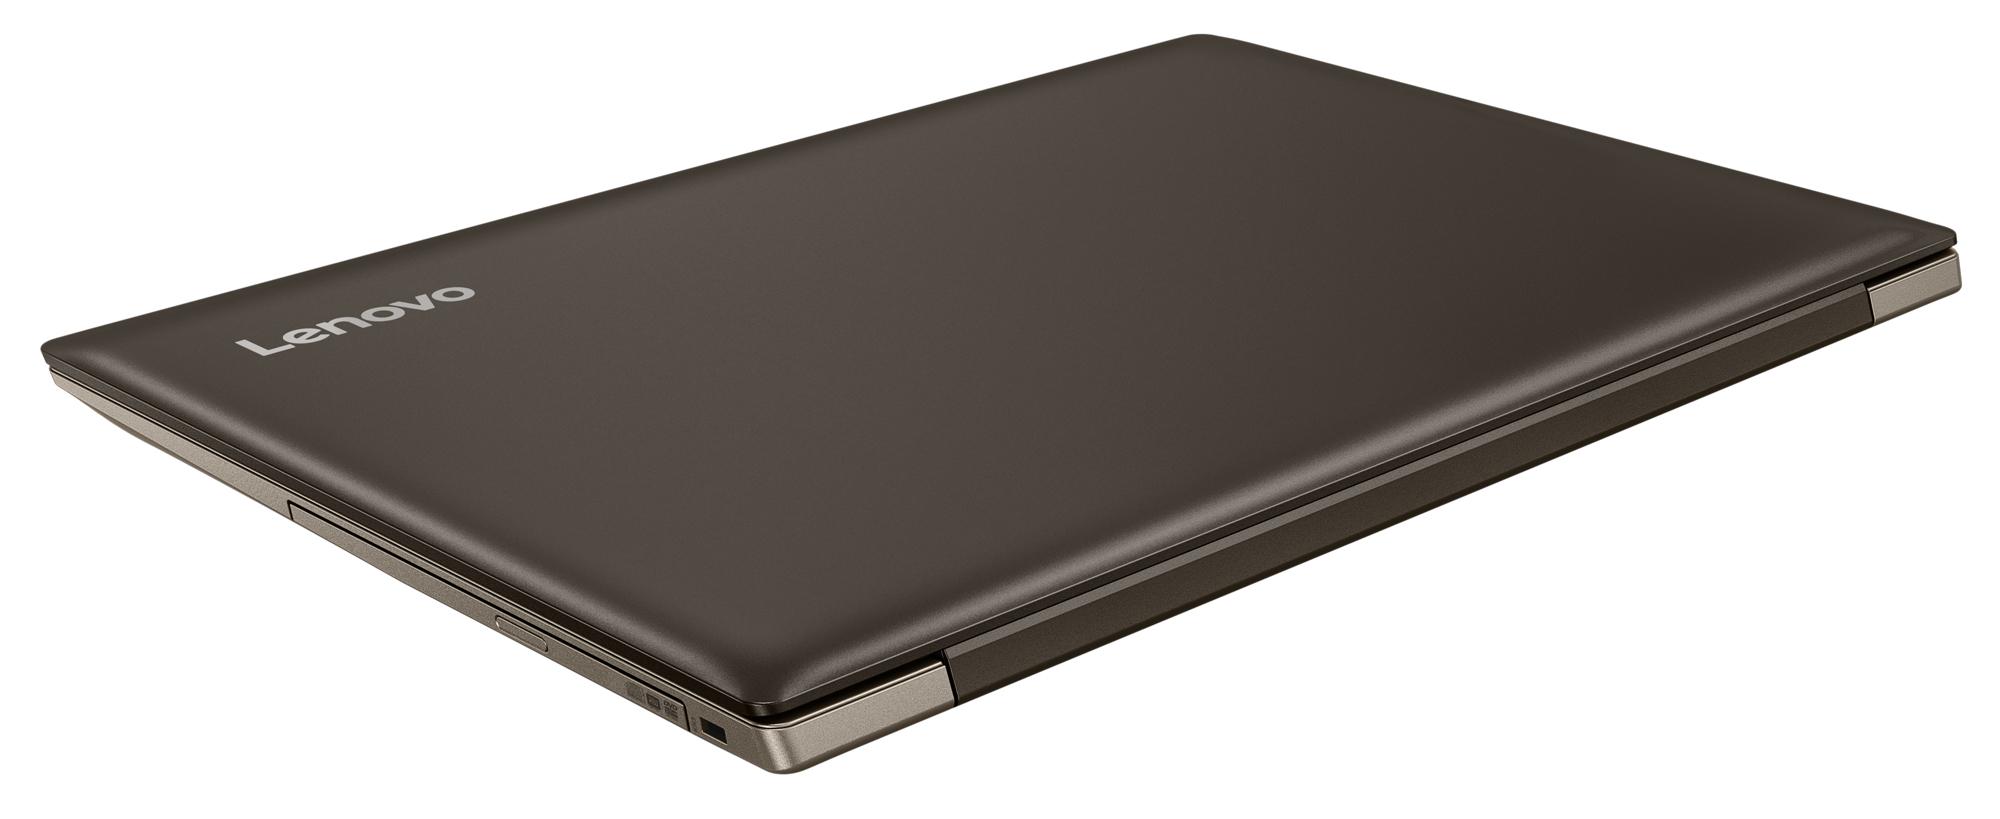 Фото  Ноутбук Lenovo ideapad 330-15 Chocolate (81D100HCRA)